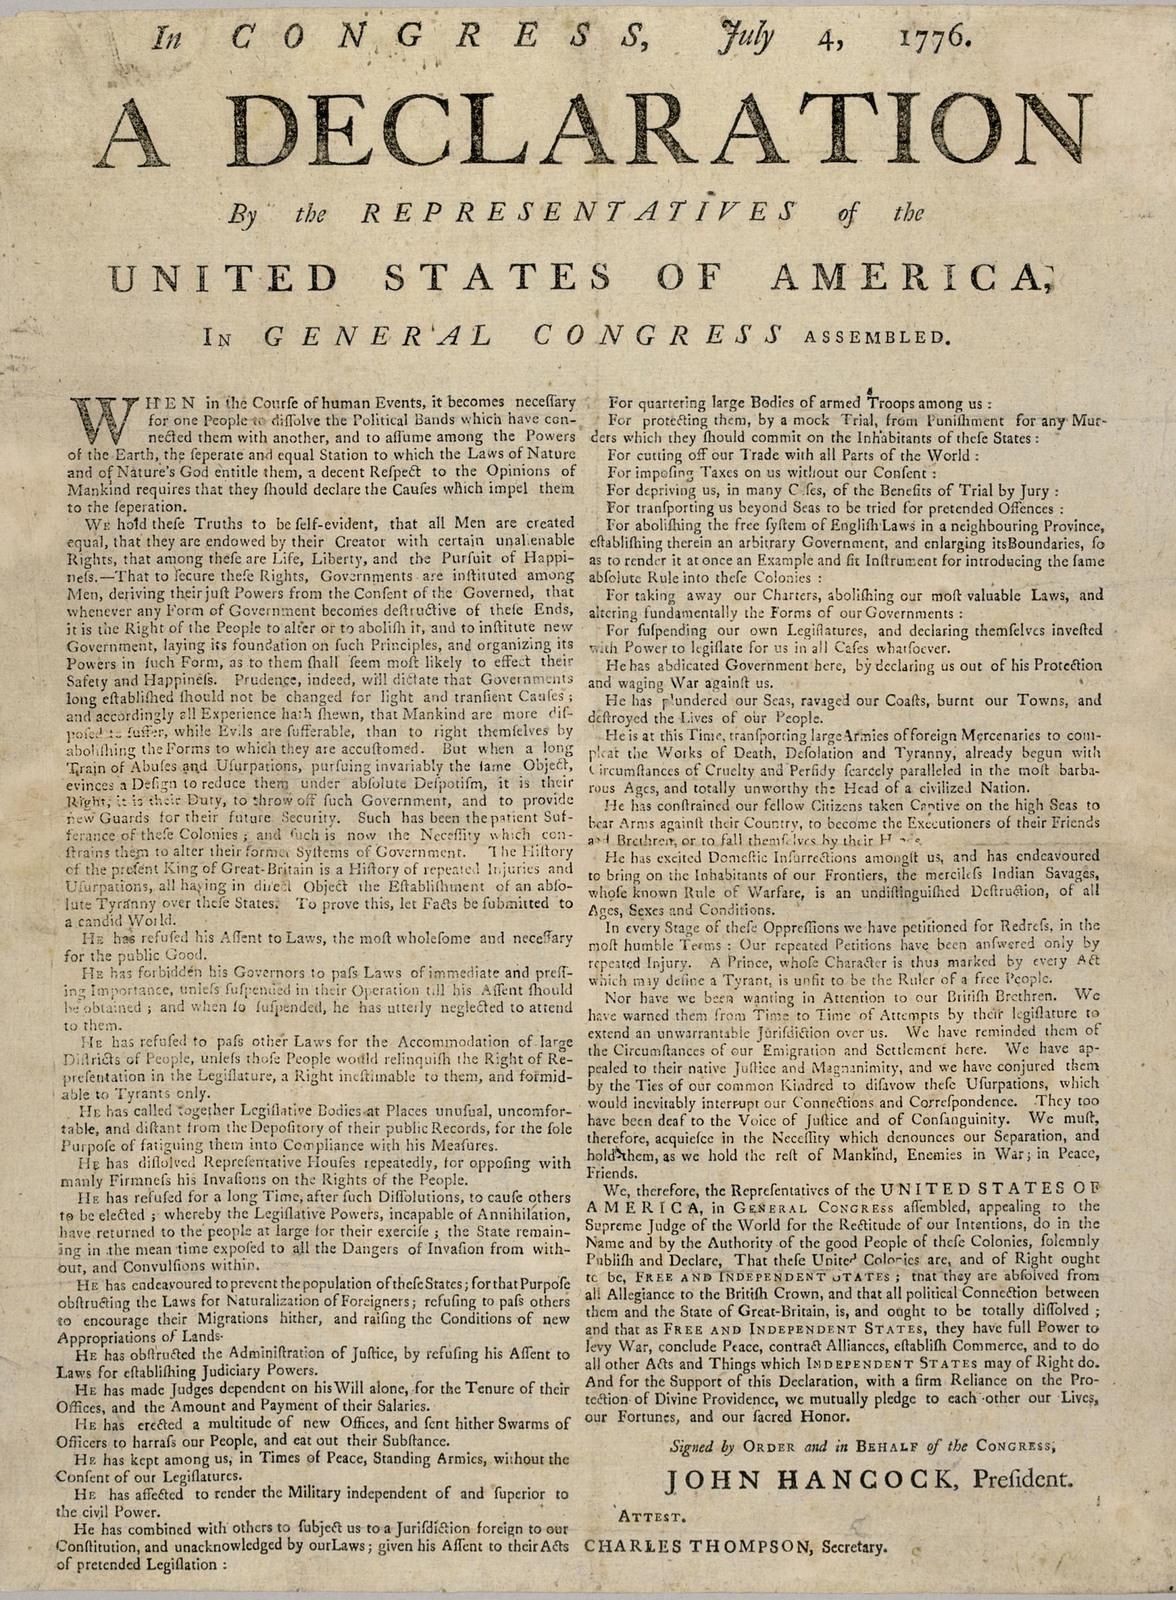 Declaration-of-Independence-broadside-1776-Jamestown-Yorktown-Foundation2